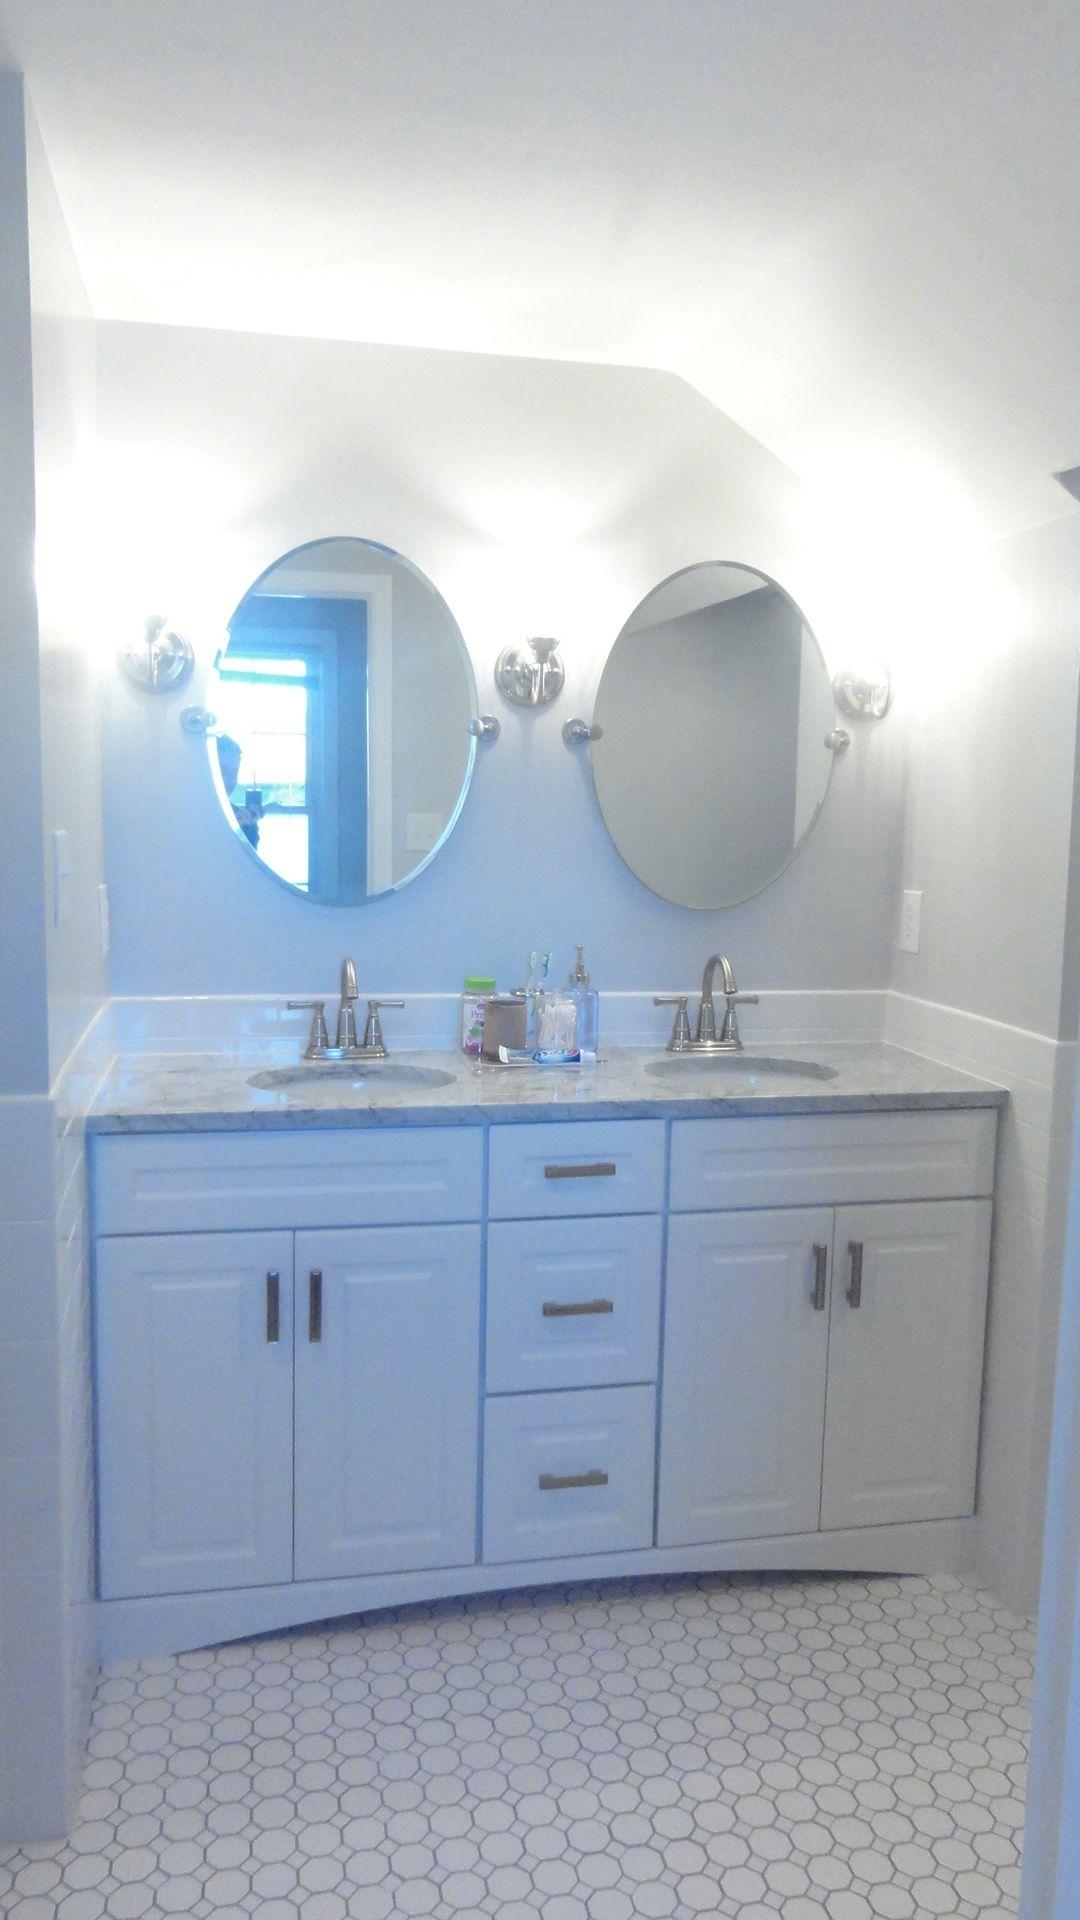 Floor. Longrake master bathroom. | Master Bath | Pinterest | Master ...